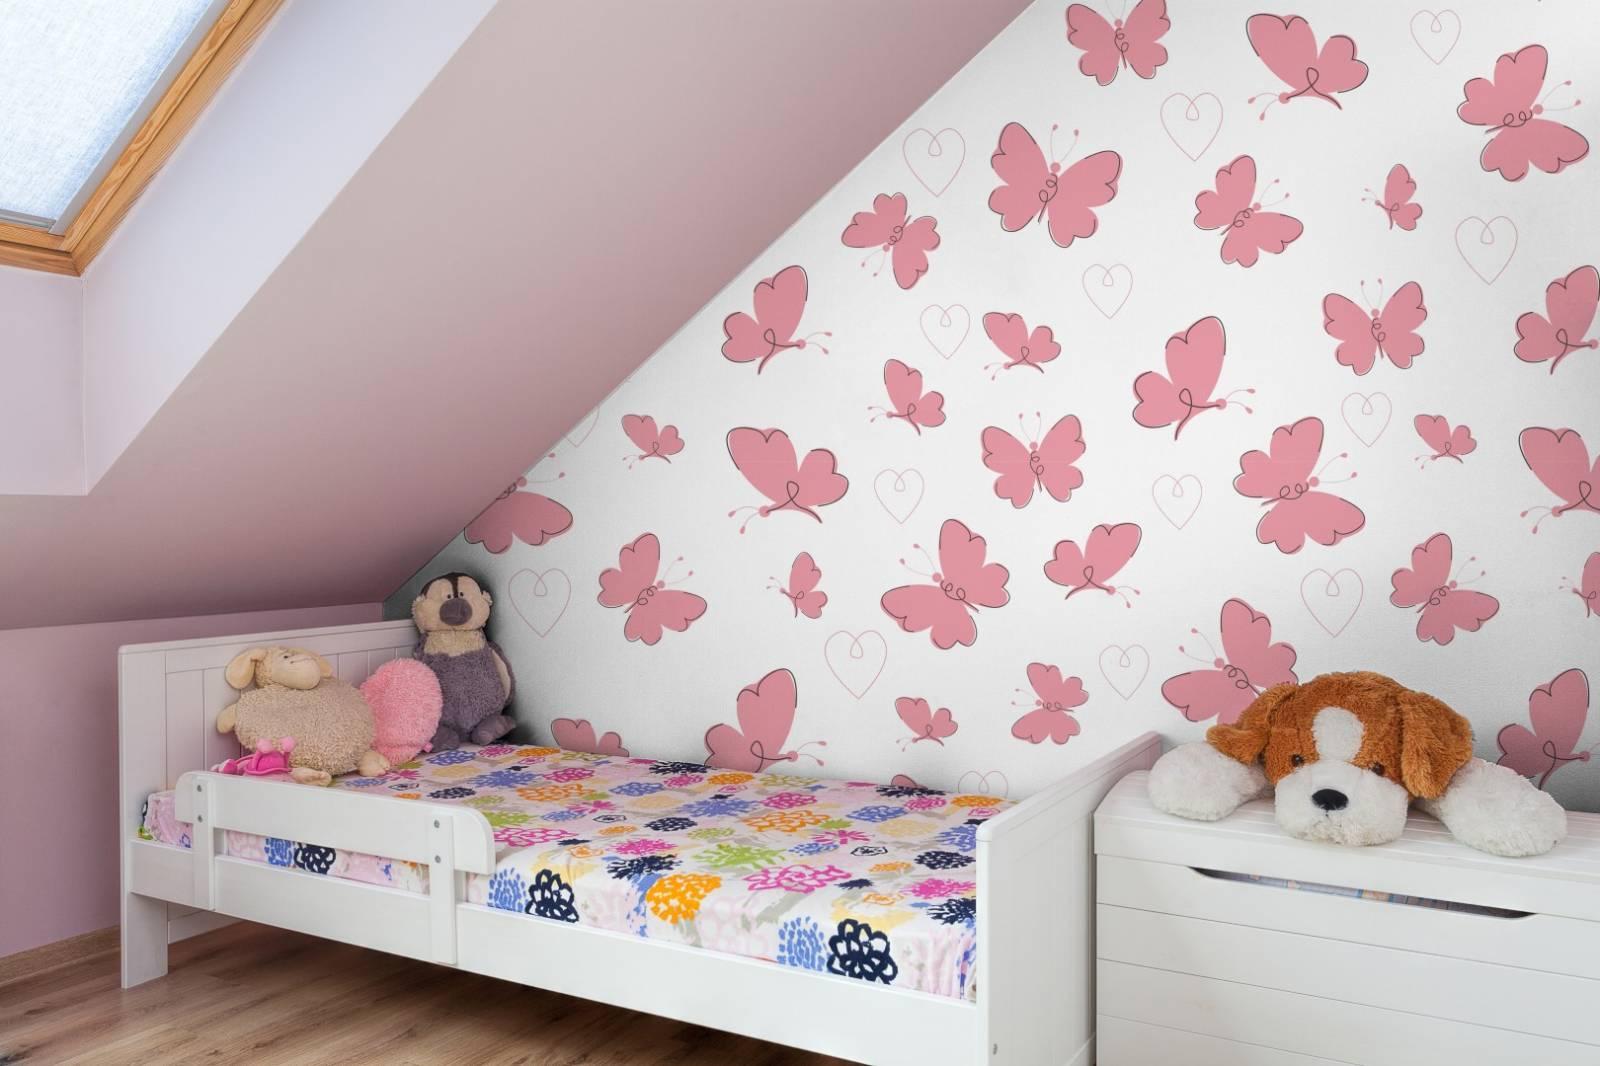 Papel de Parede Adesivo  Pink Butterflies /Rolo  imagem 3